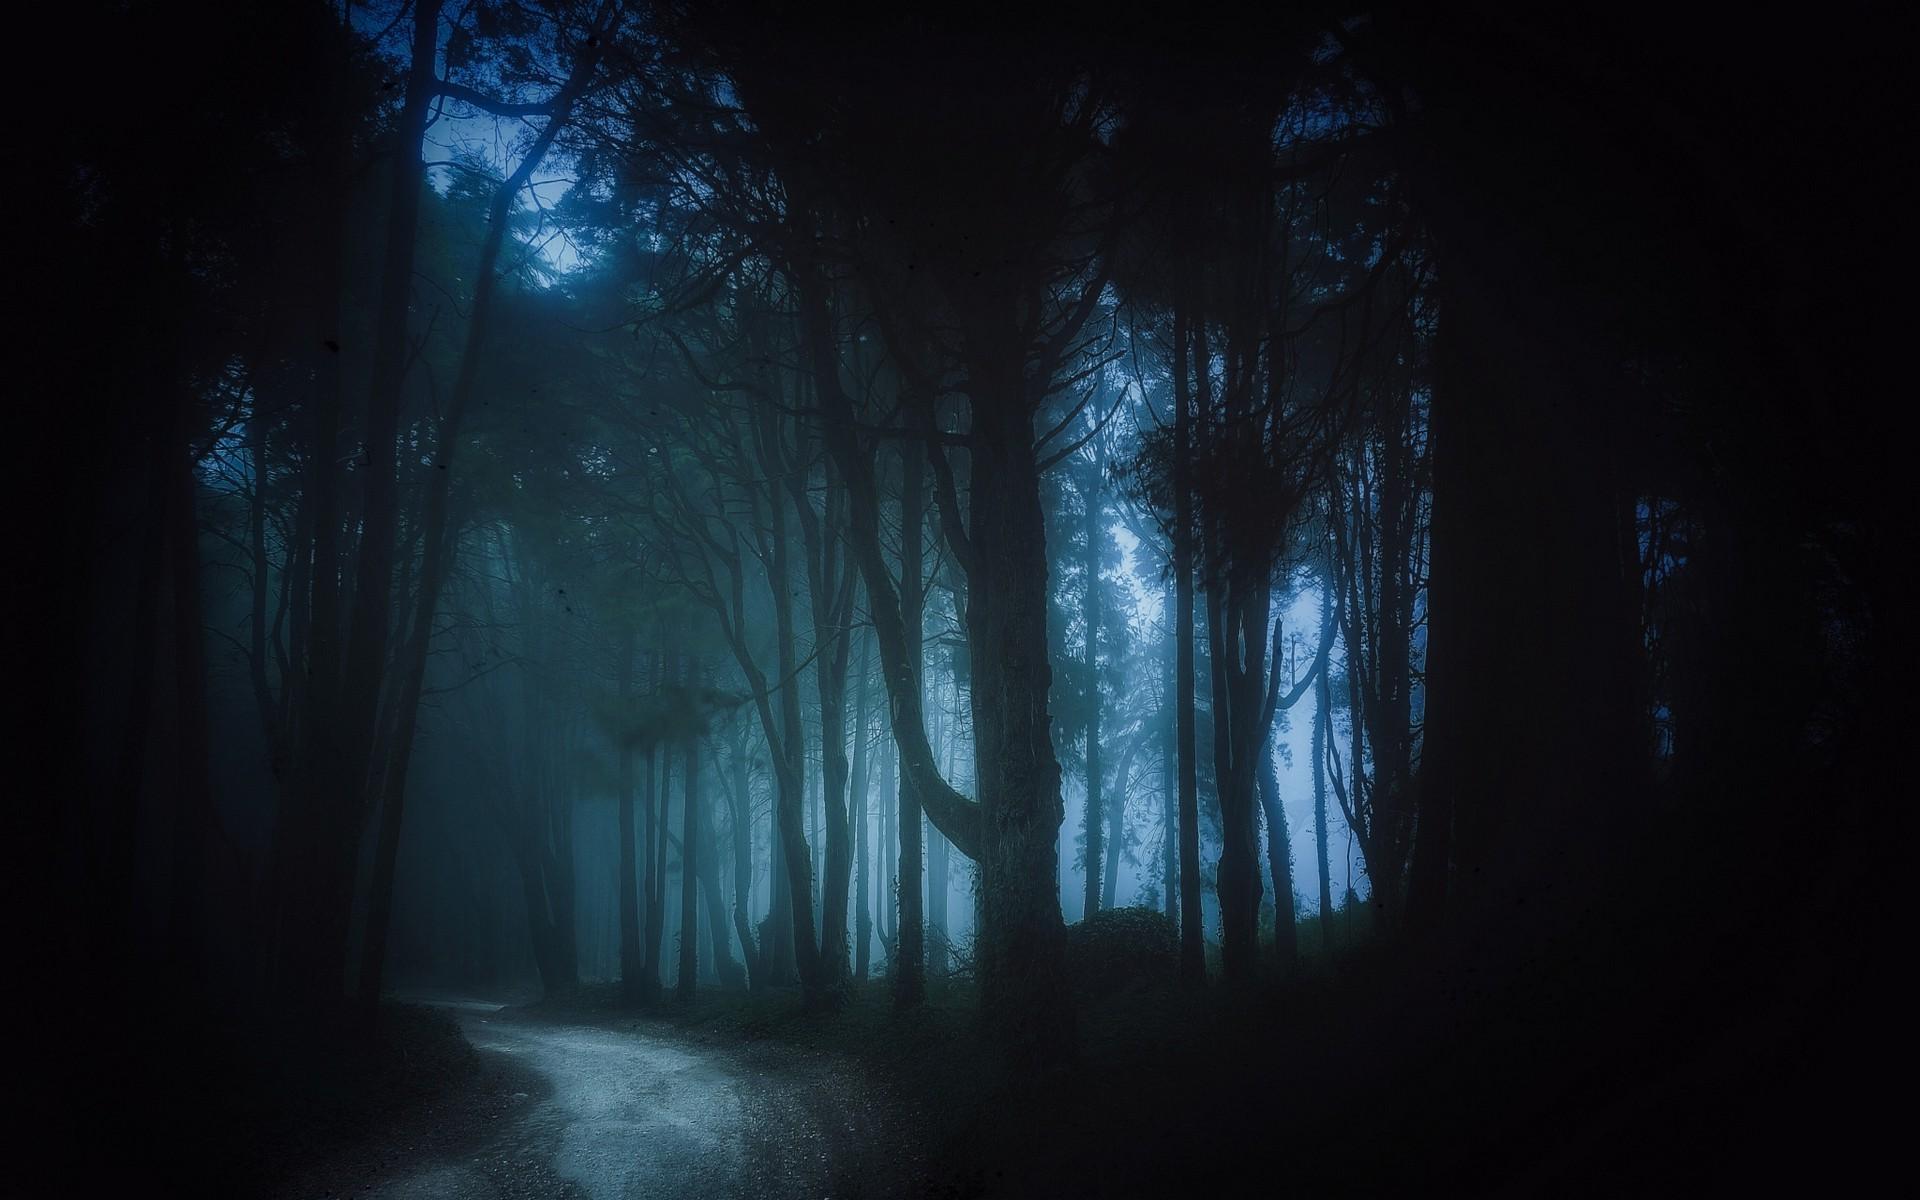 Trees Landscape Forest Black Dark Night Nature Mist Dirt Road Atmosphere Path Midnight Formation Light Tree